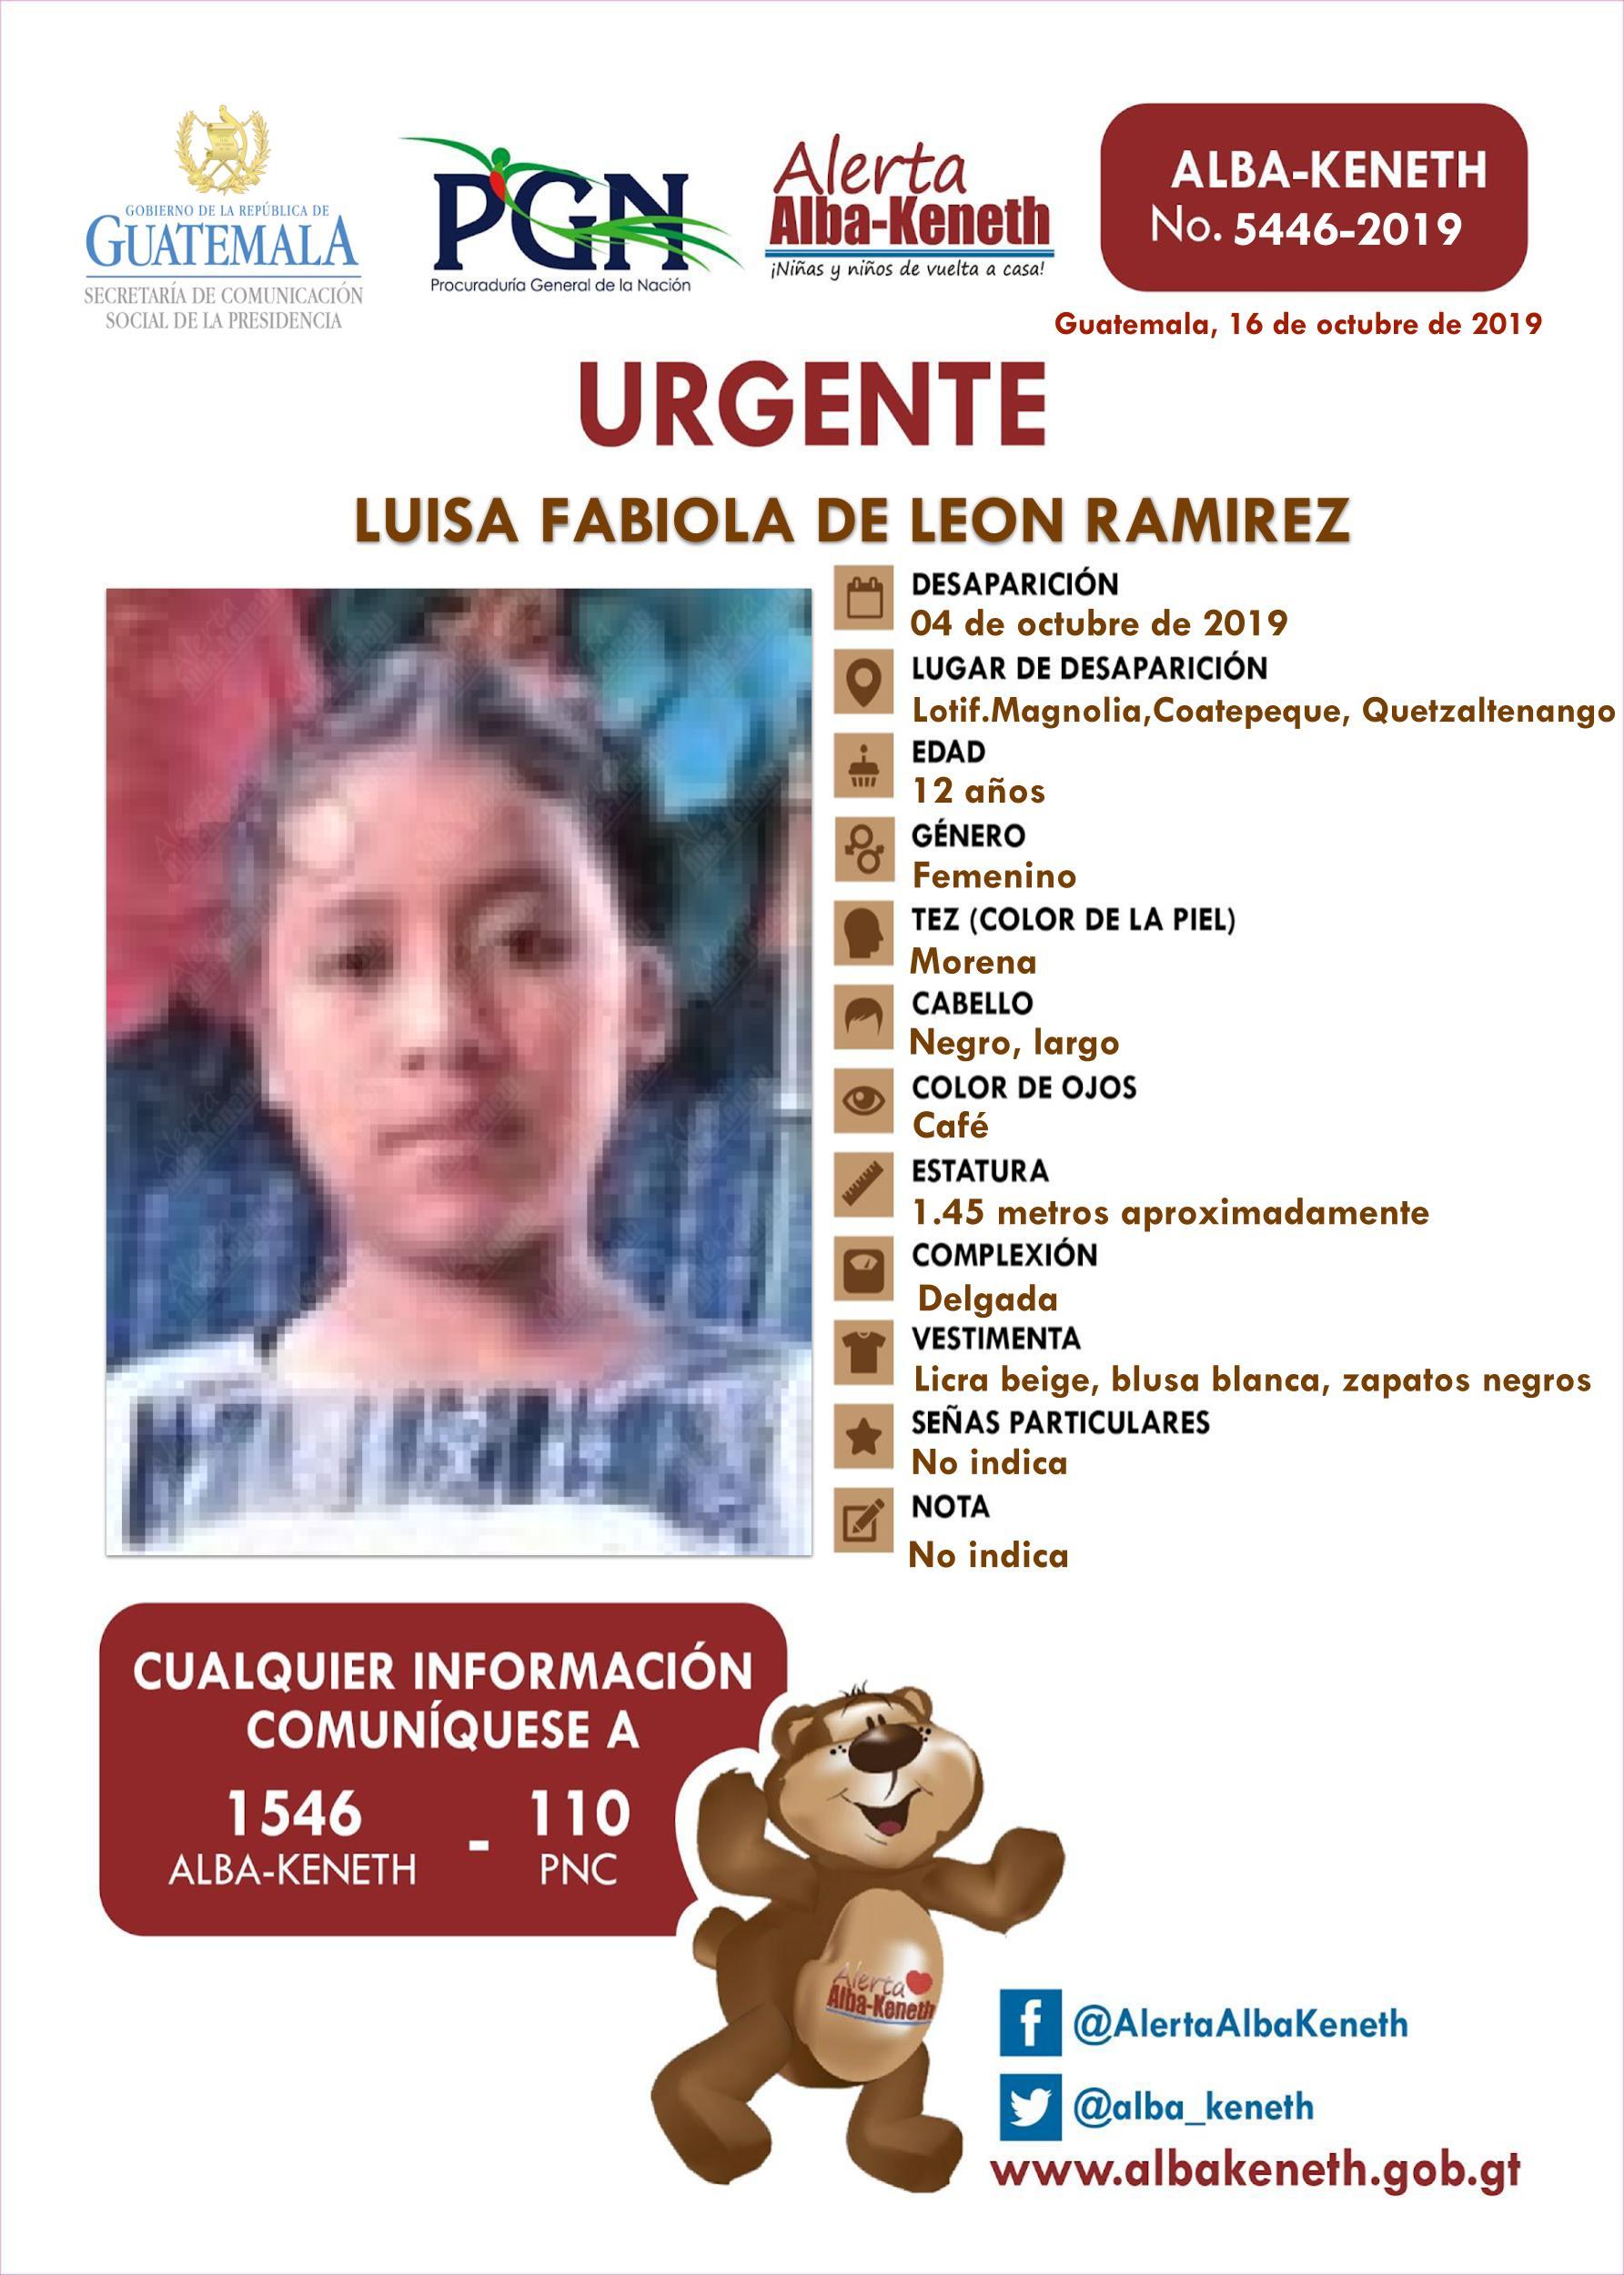 Luisa Fabiola de Leon Ramirez